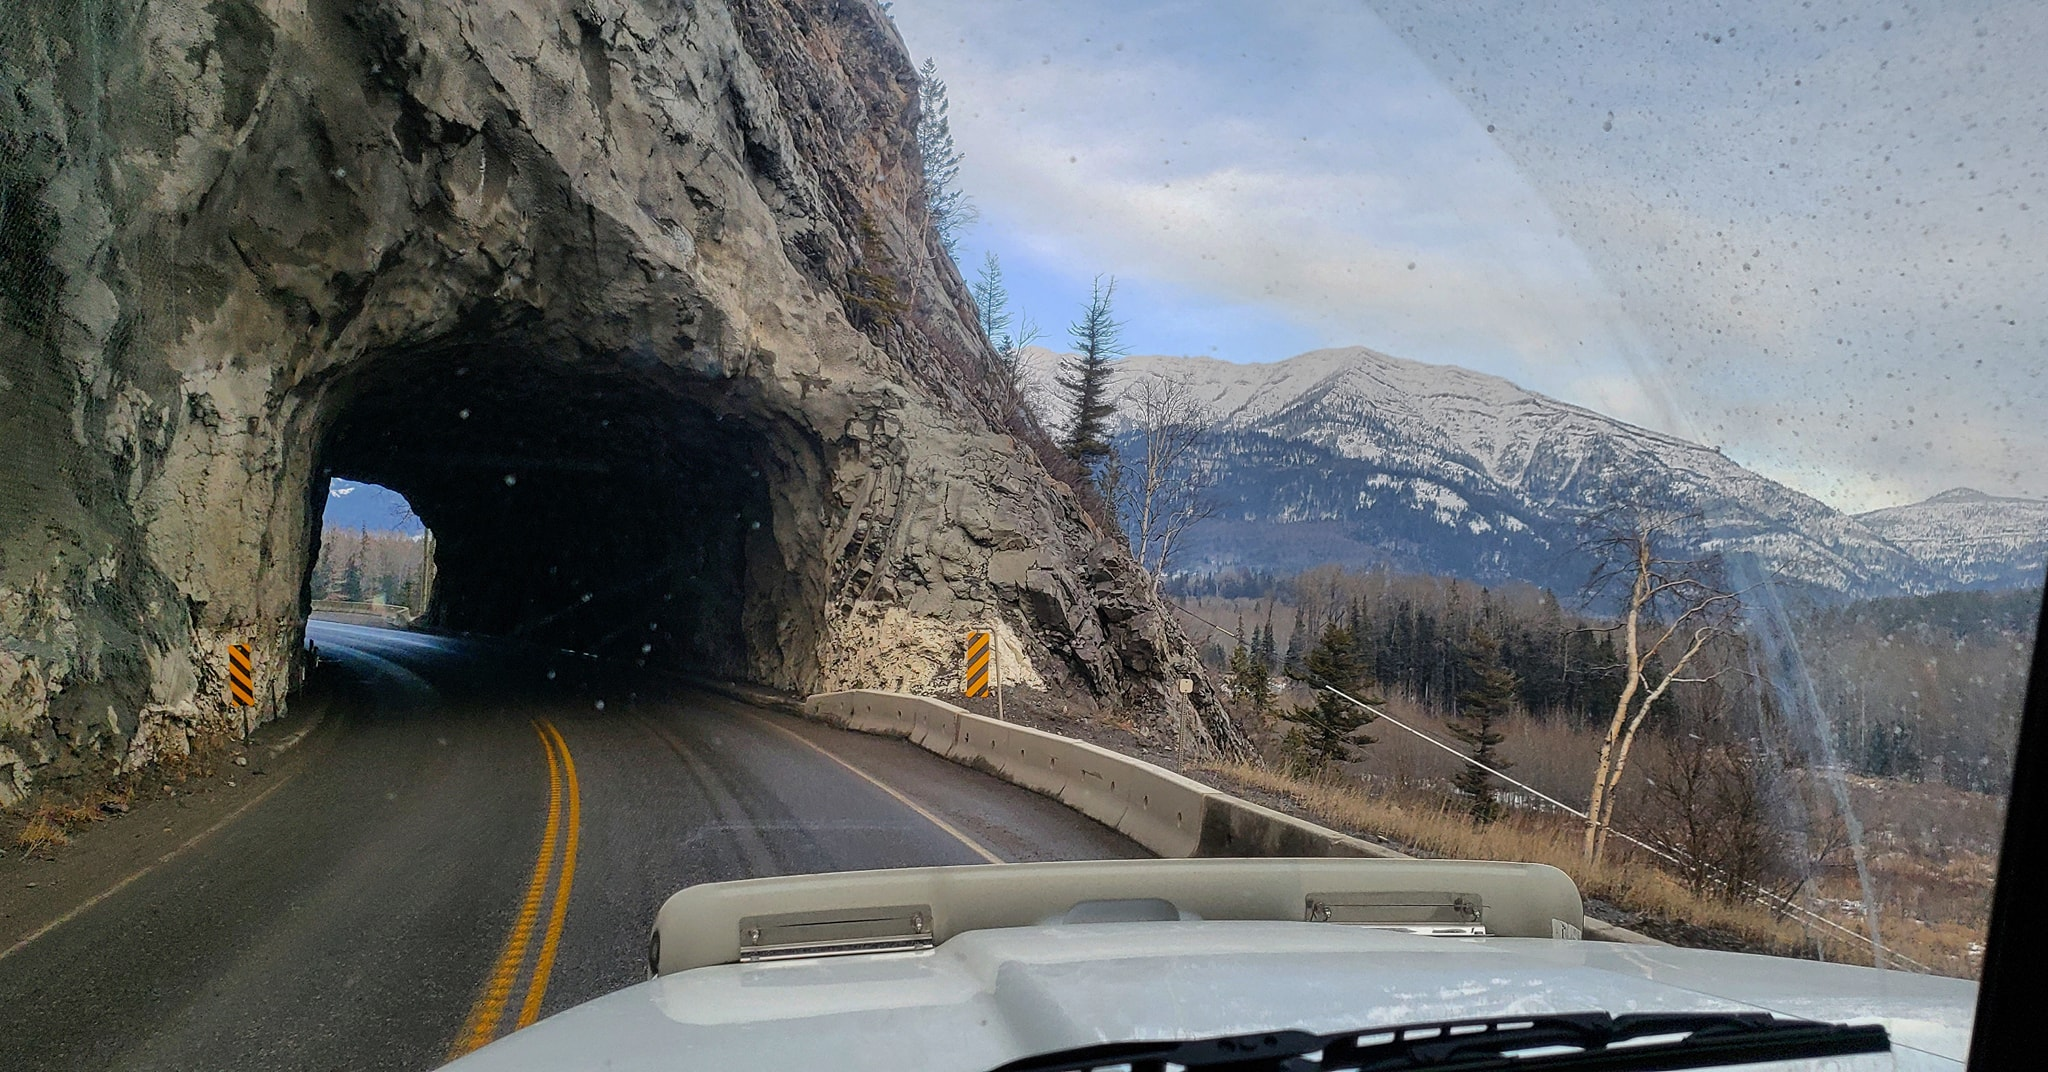 6-1-2019-rondreis-van-2800-km-Montana-Idaho-Oregon-Washington-(8)